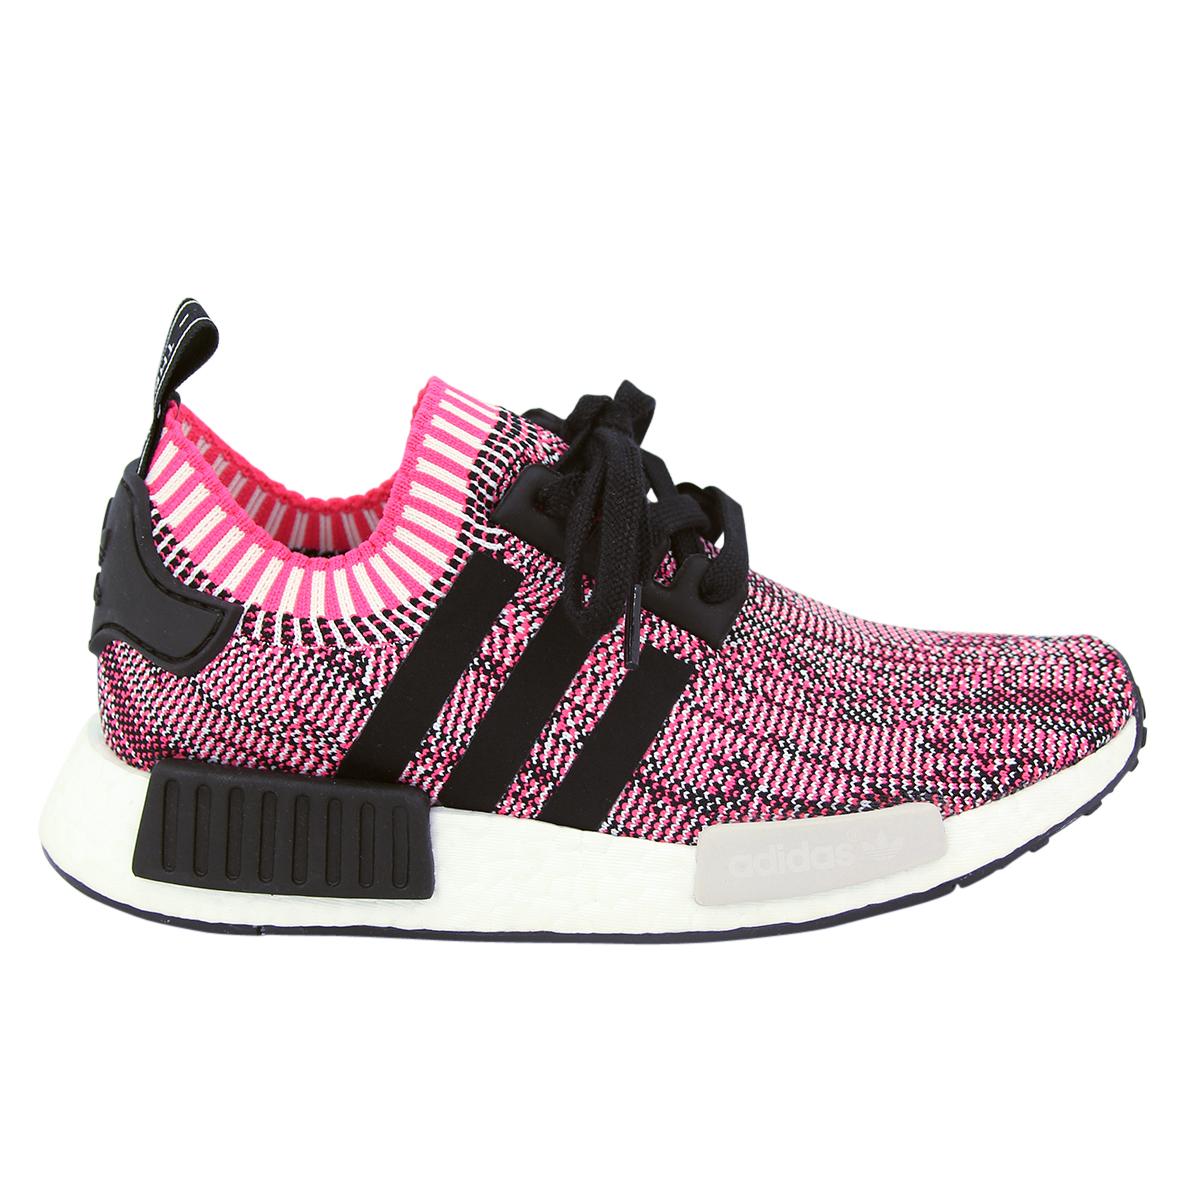 Details zu Adidas NMD R1 W PRIMEKNIT Damen Sneakers Schuhe Neu